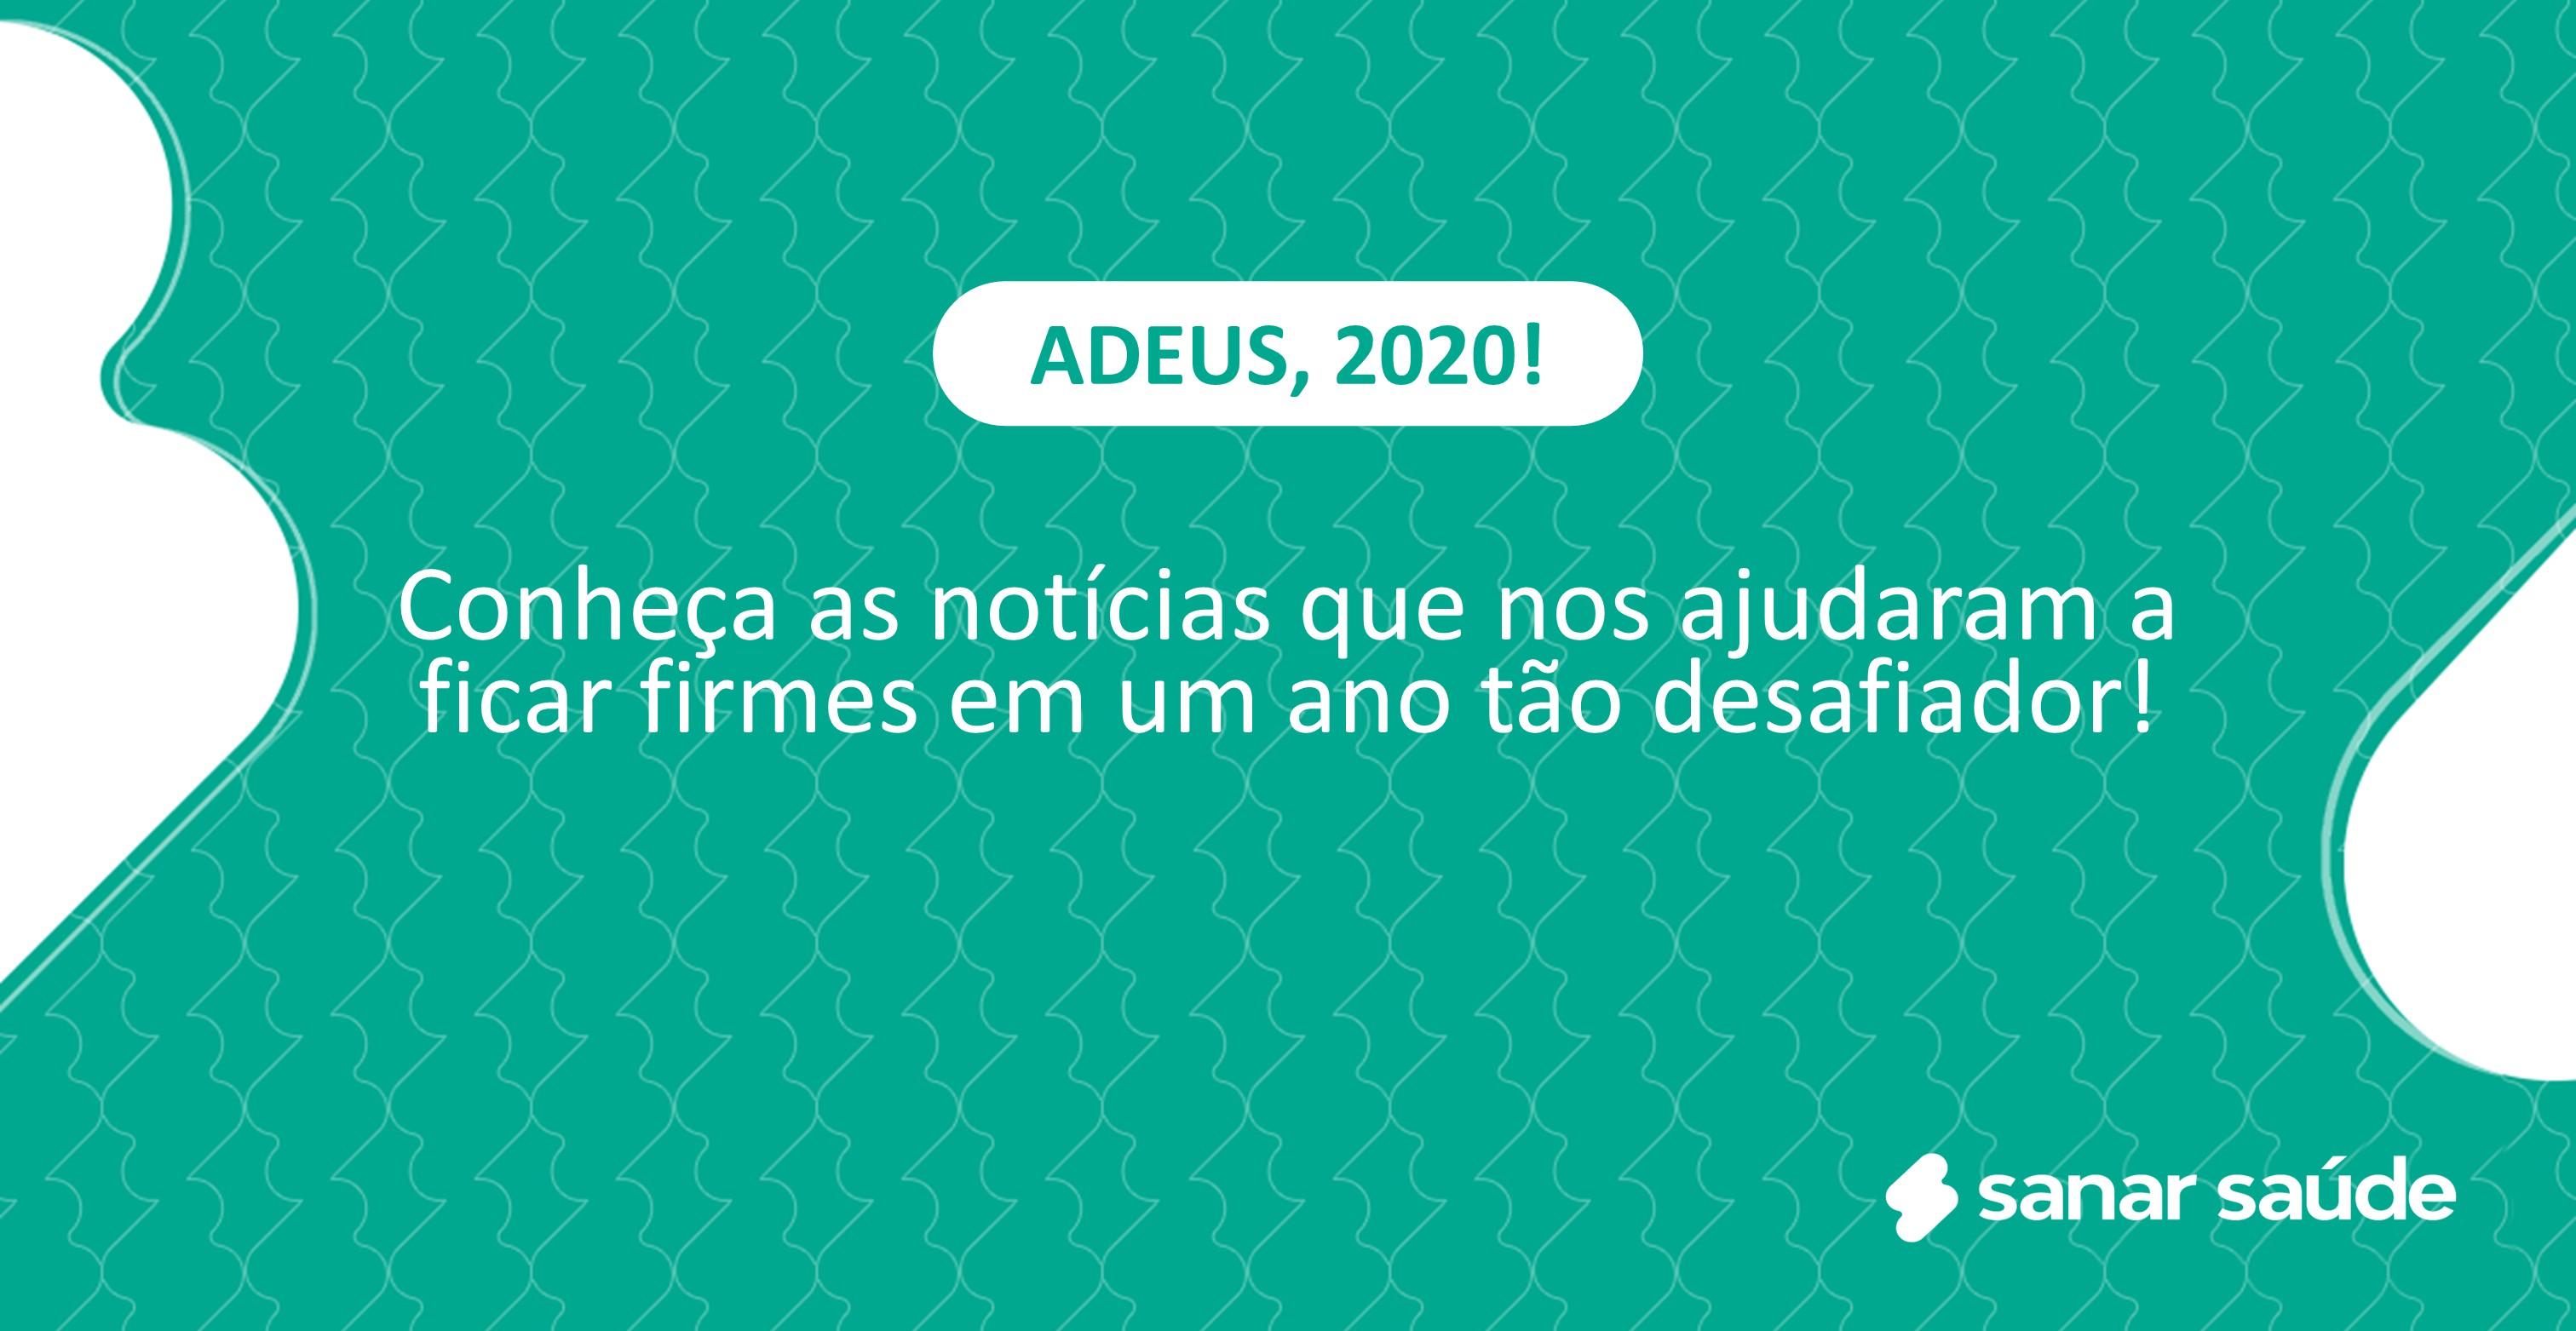 1-boas-noticias-2020.jpg (426 KB)